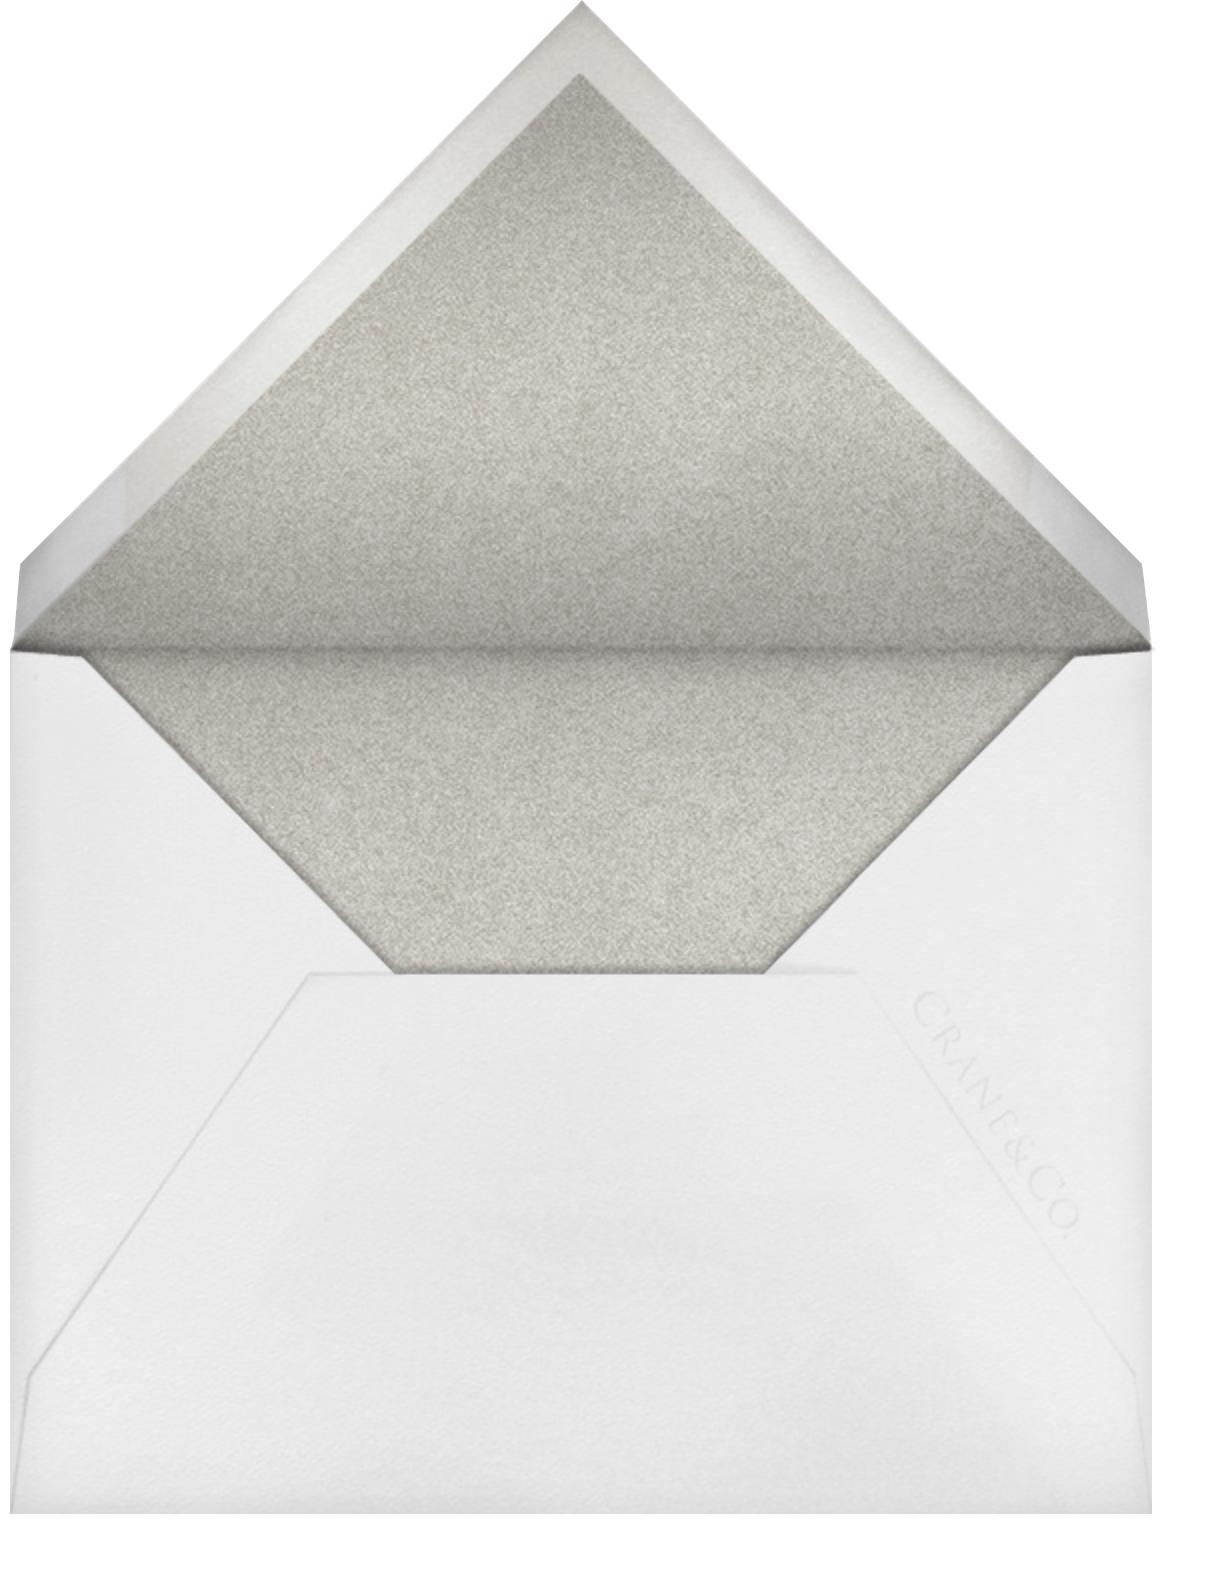 Polka Dot - Platinum - Oscar de la Renta - null - envelope back